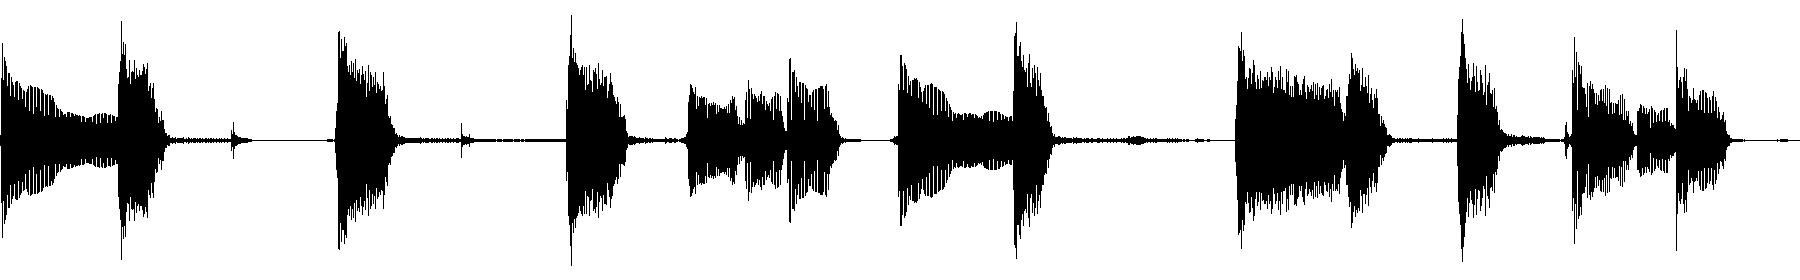 guitarreggae02 80